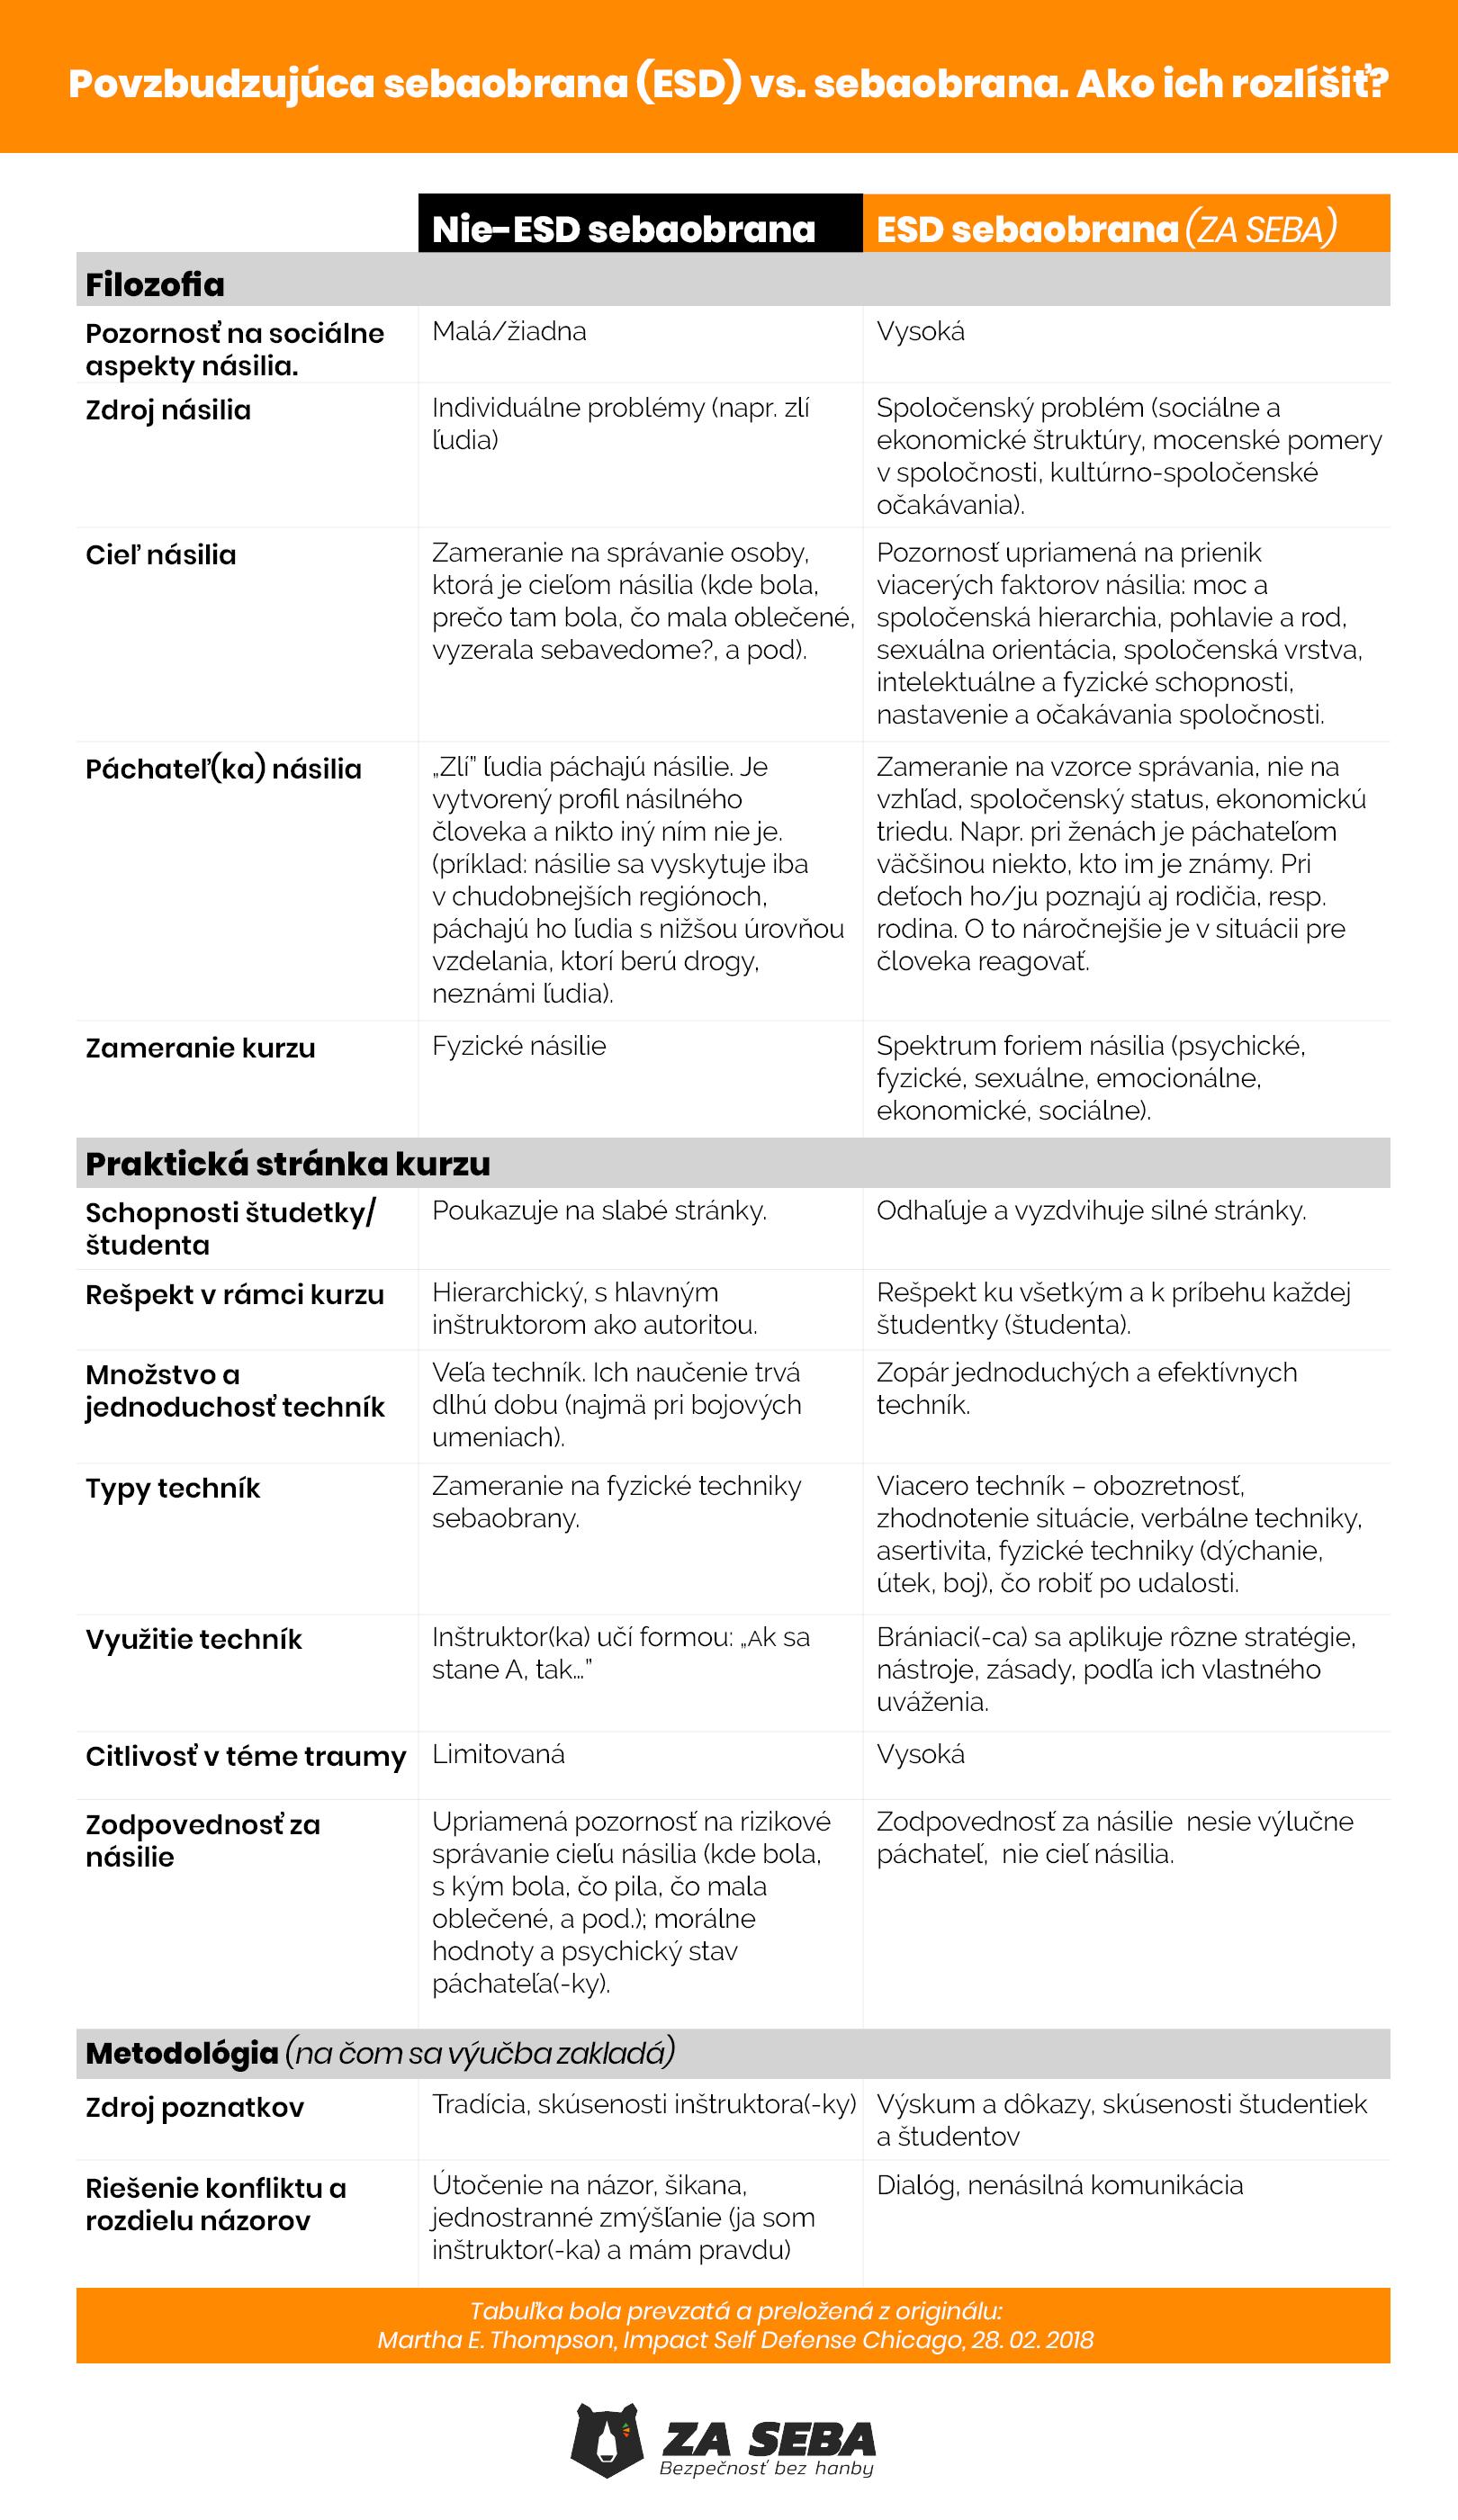 Povzbudzujúca sebaobrana vs sebaobrana_desktop